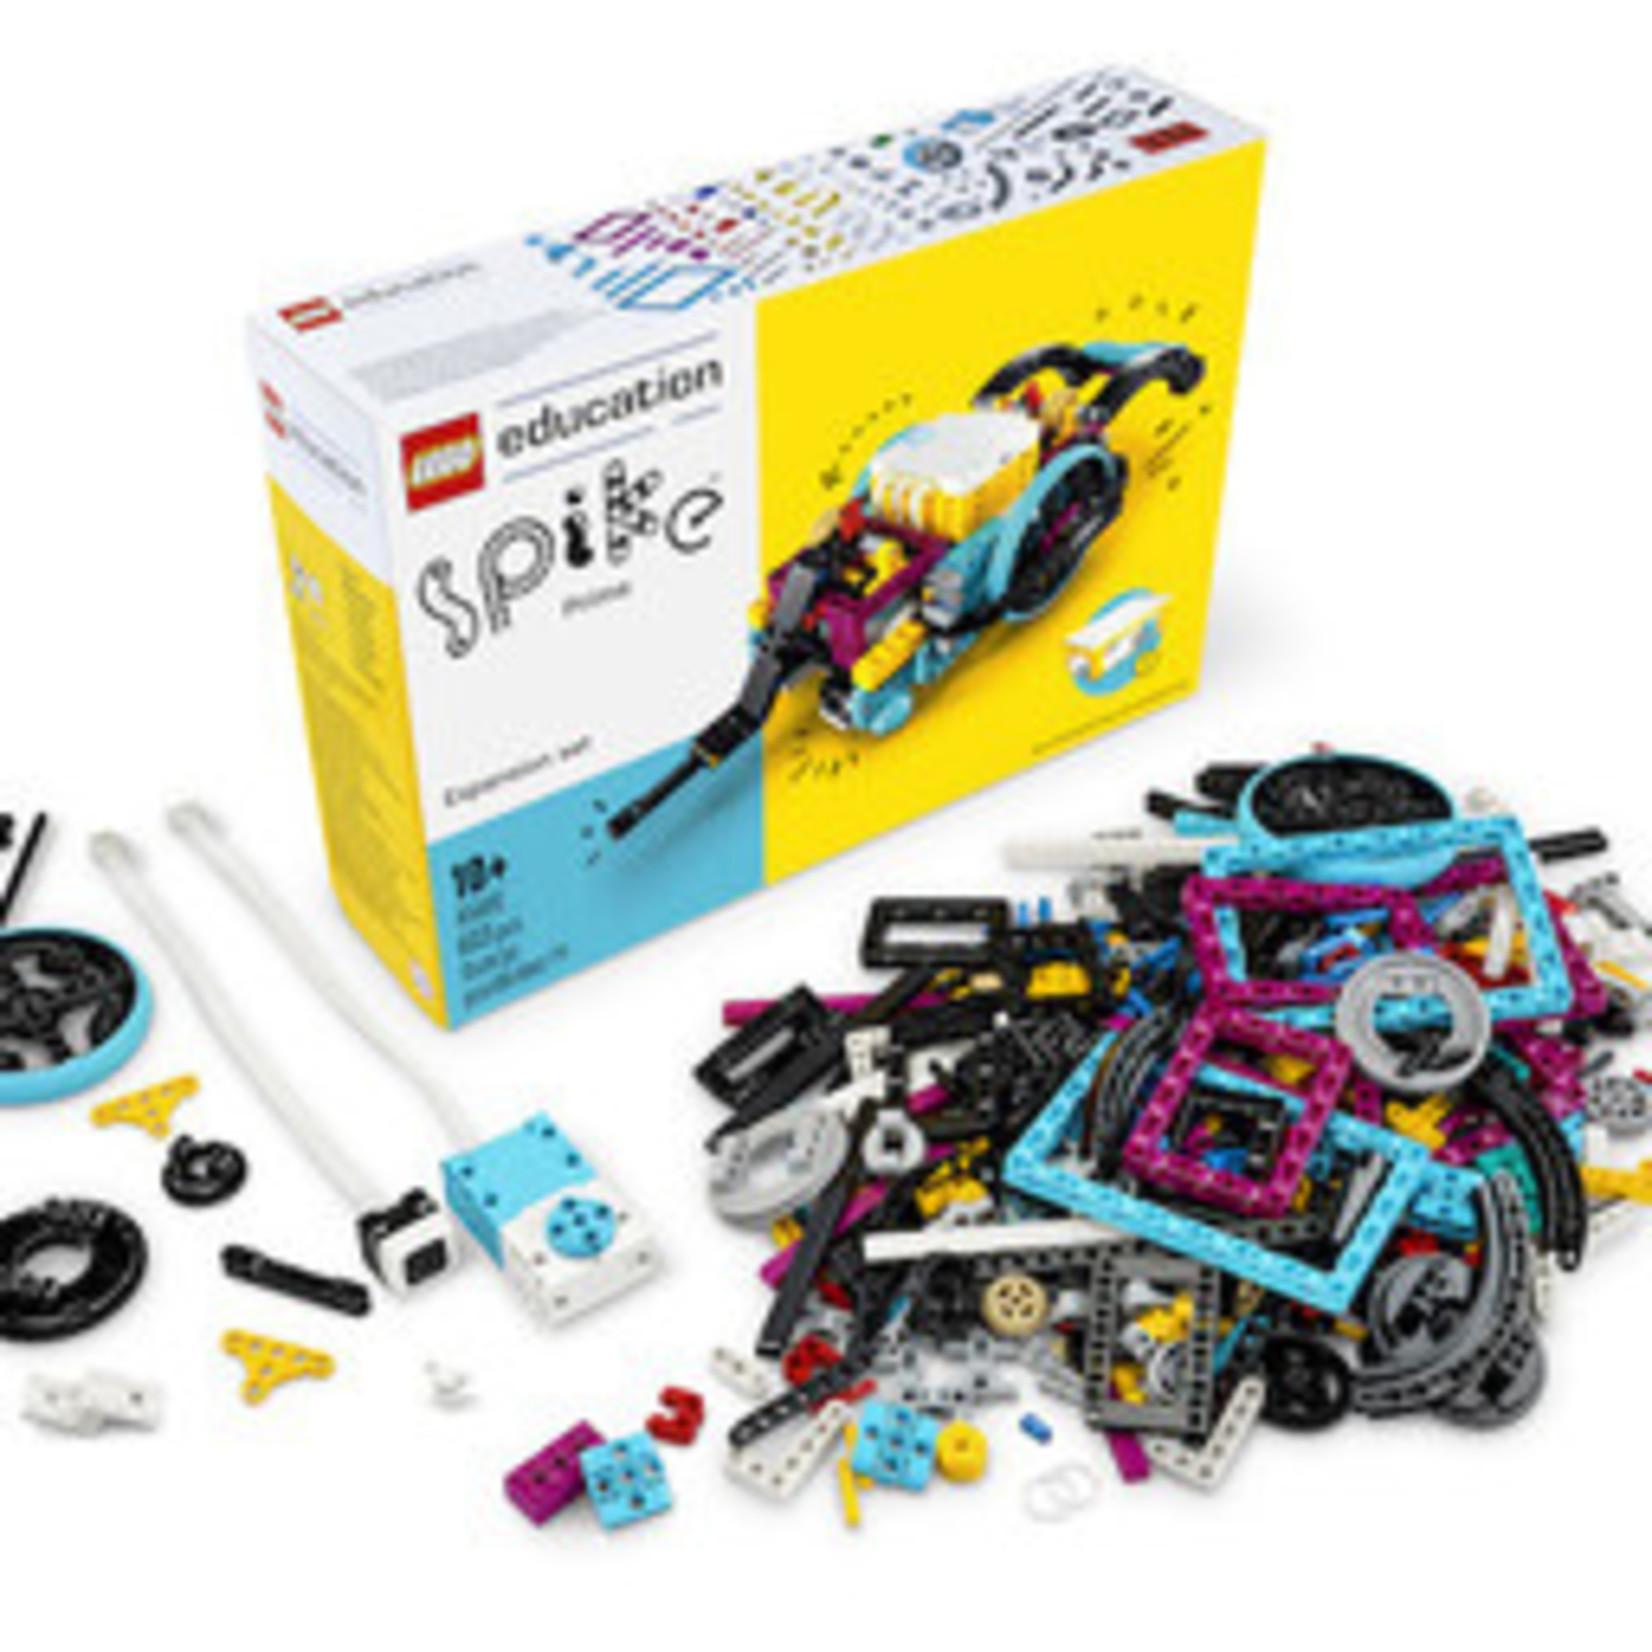 LEGO® Education SPIKE™ Prime Uitbreidingsset